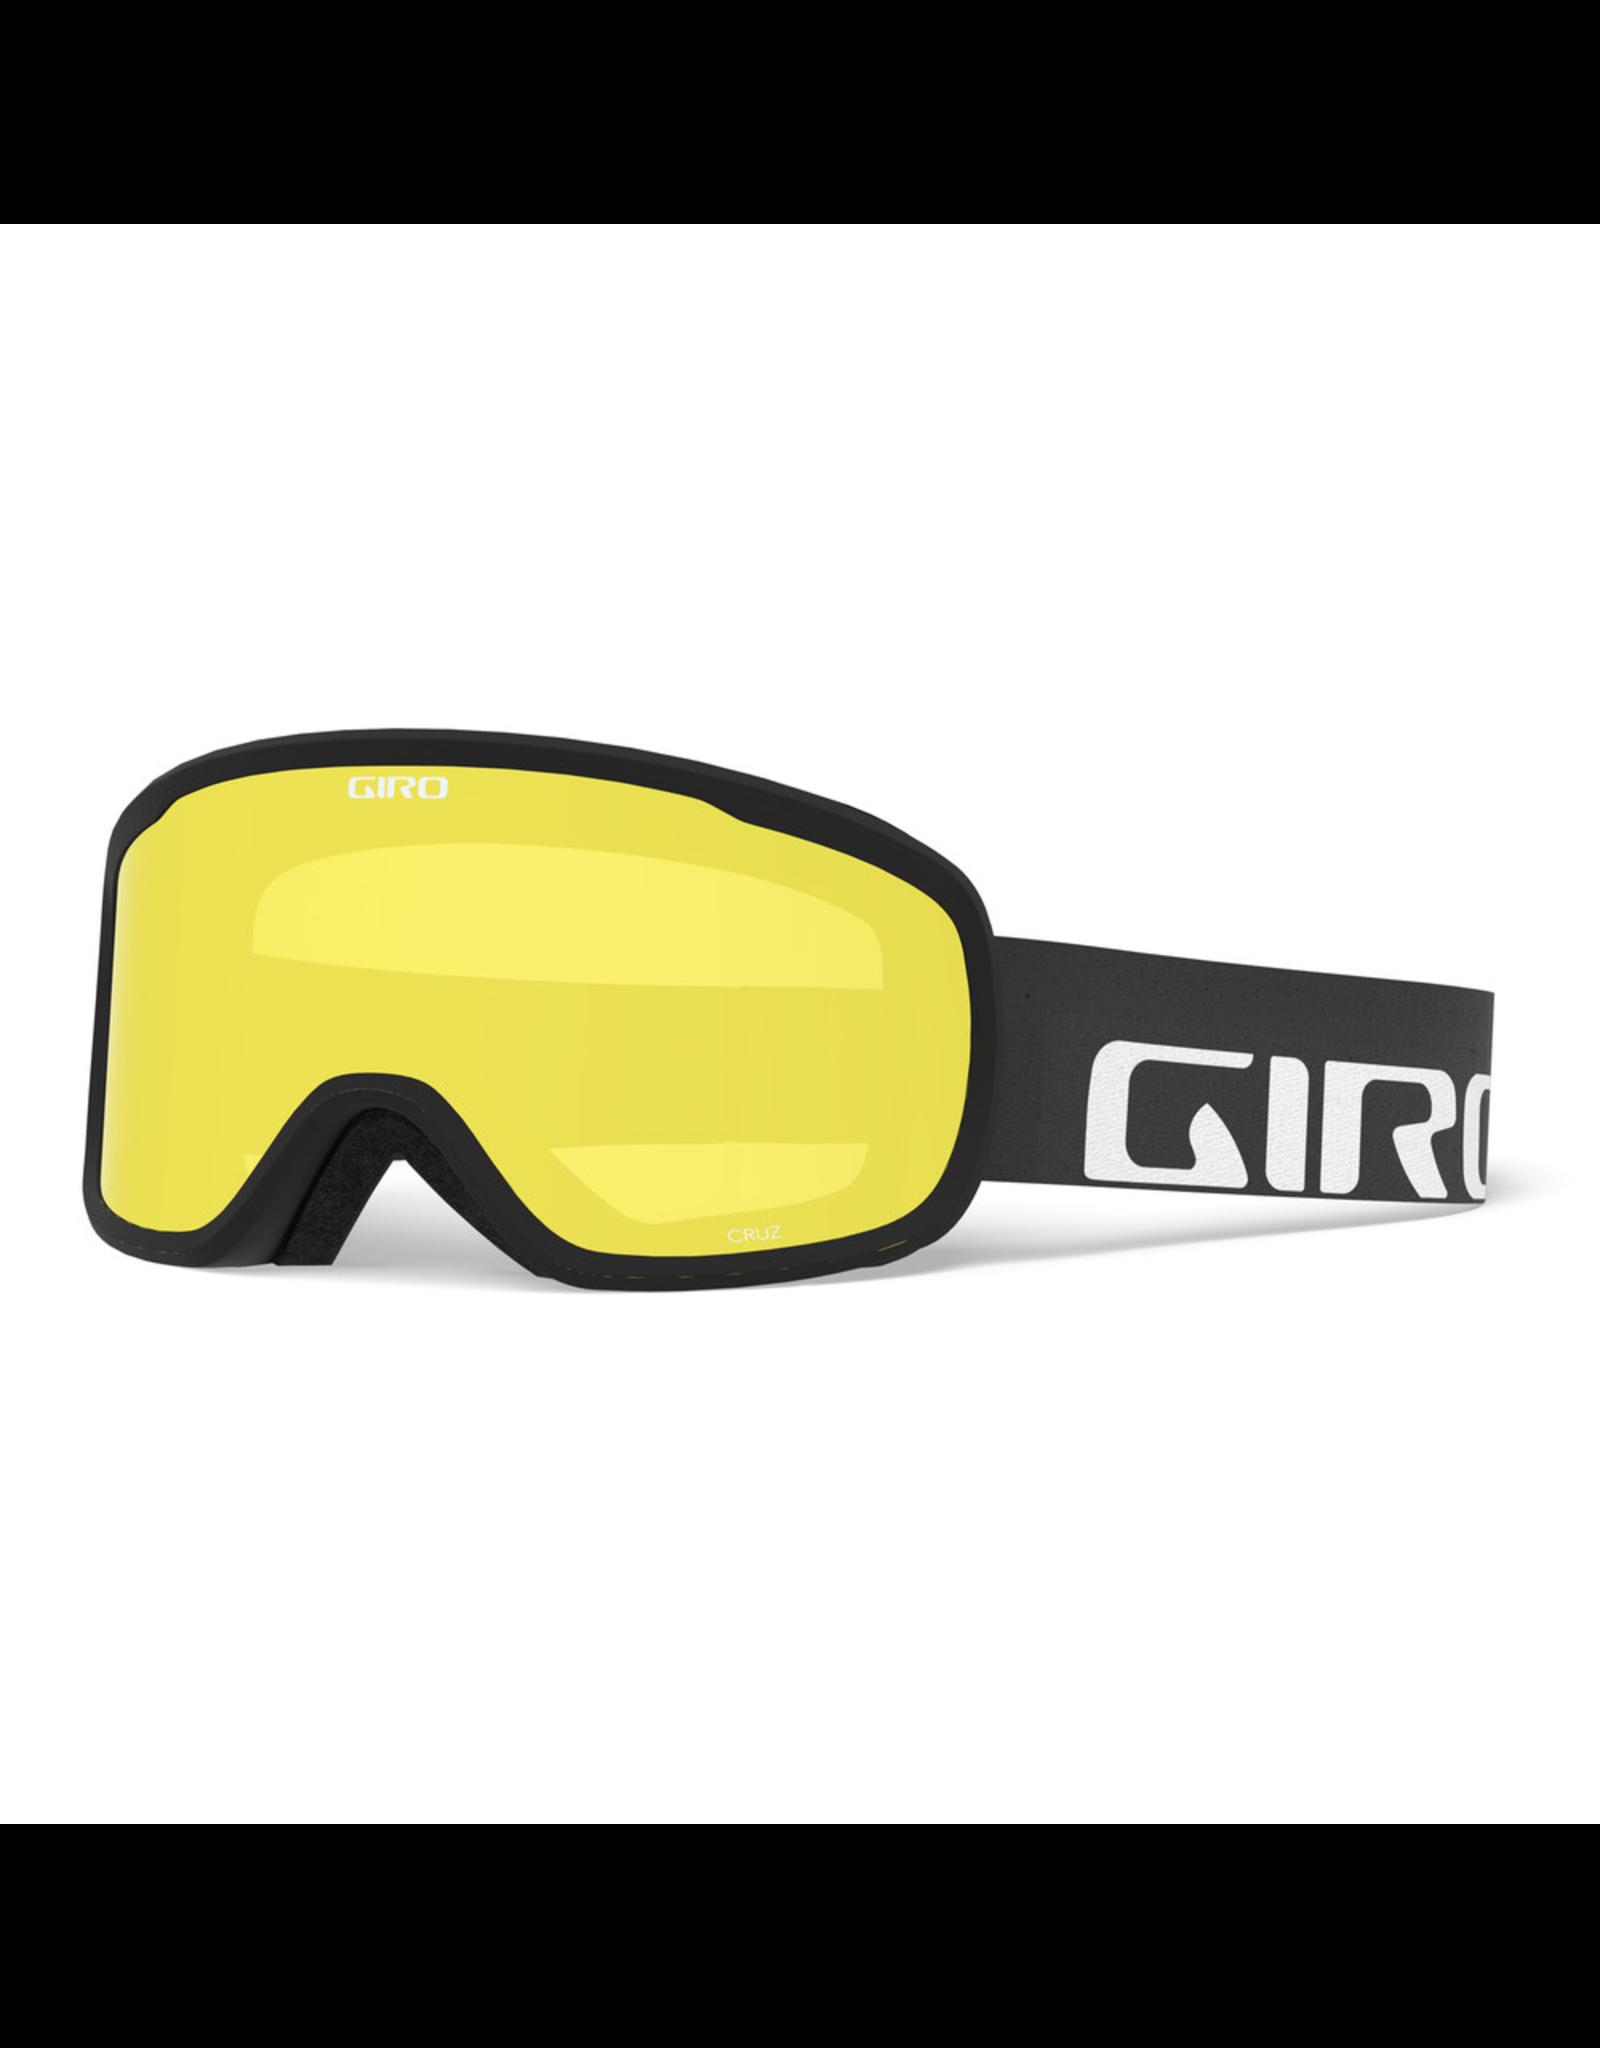 GIRO CRUZ BLACK WDMRK YEL BST SR 20 SKI GOGGLE